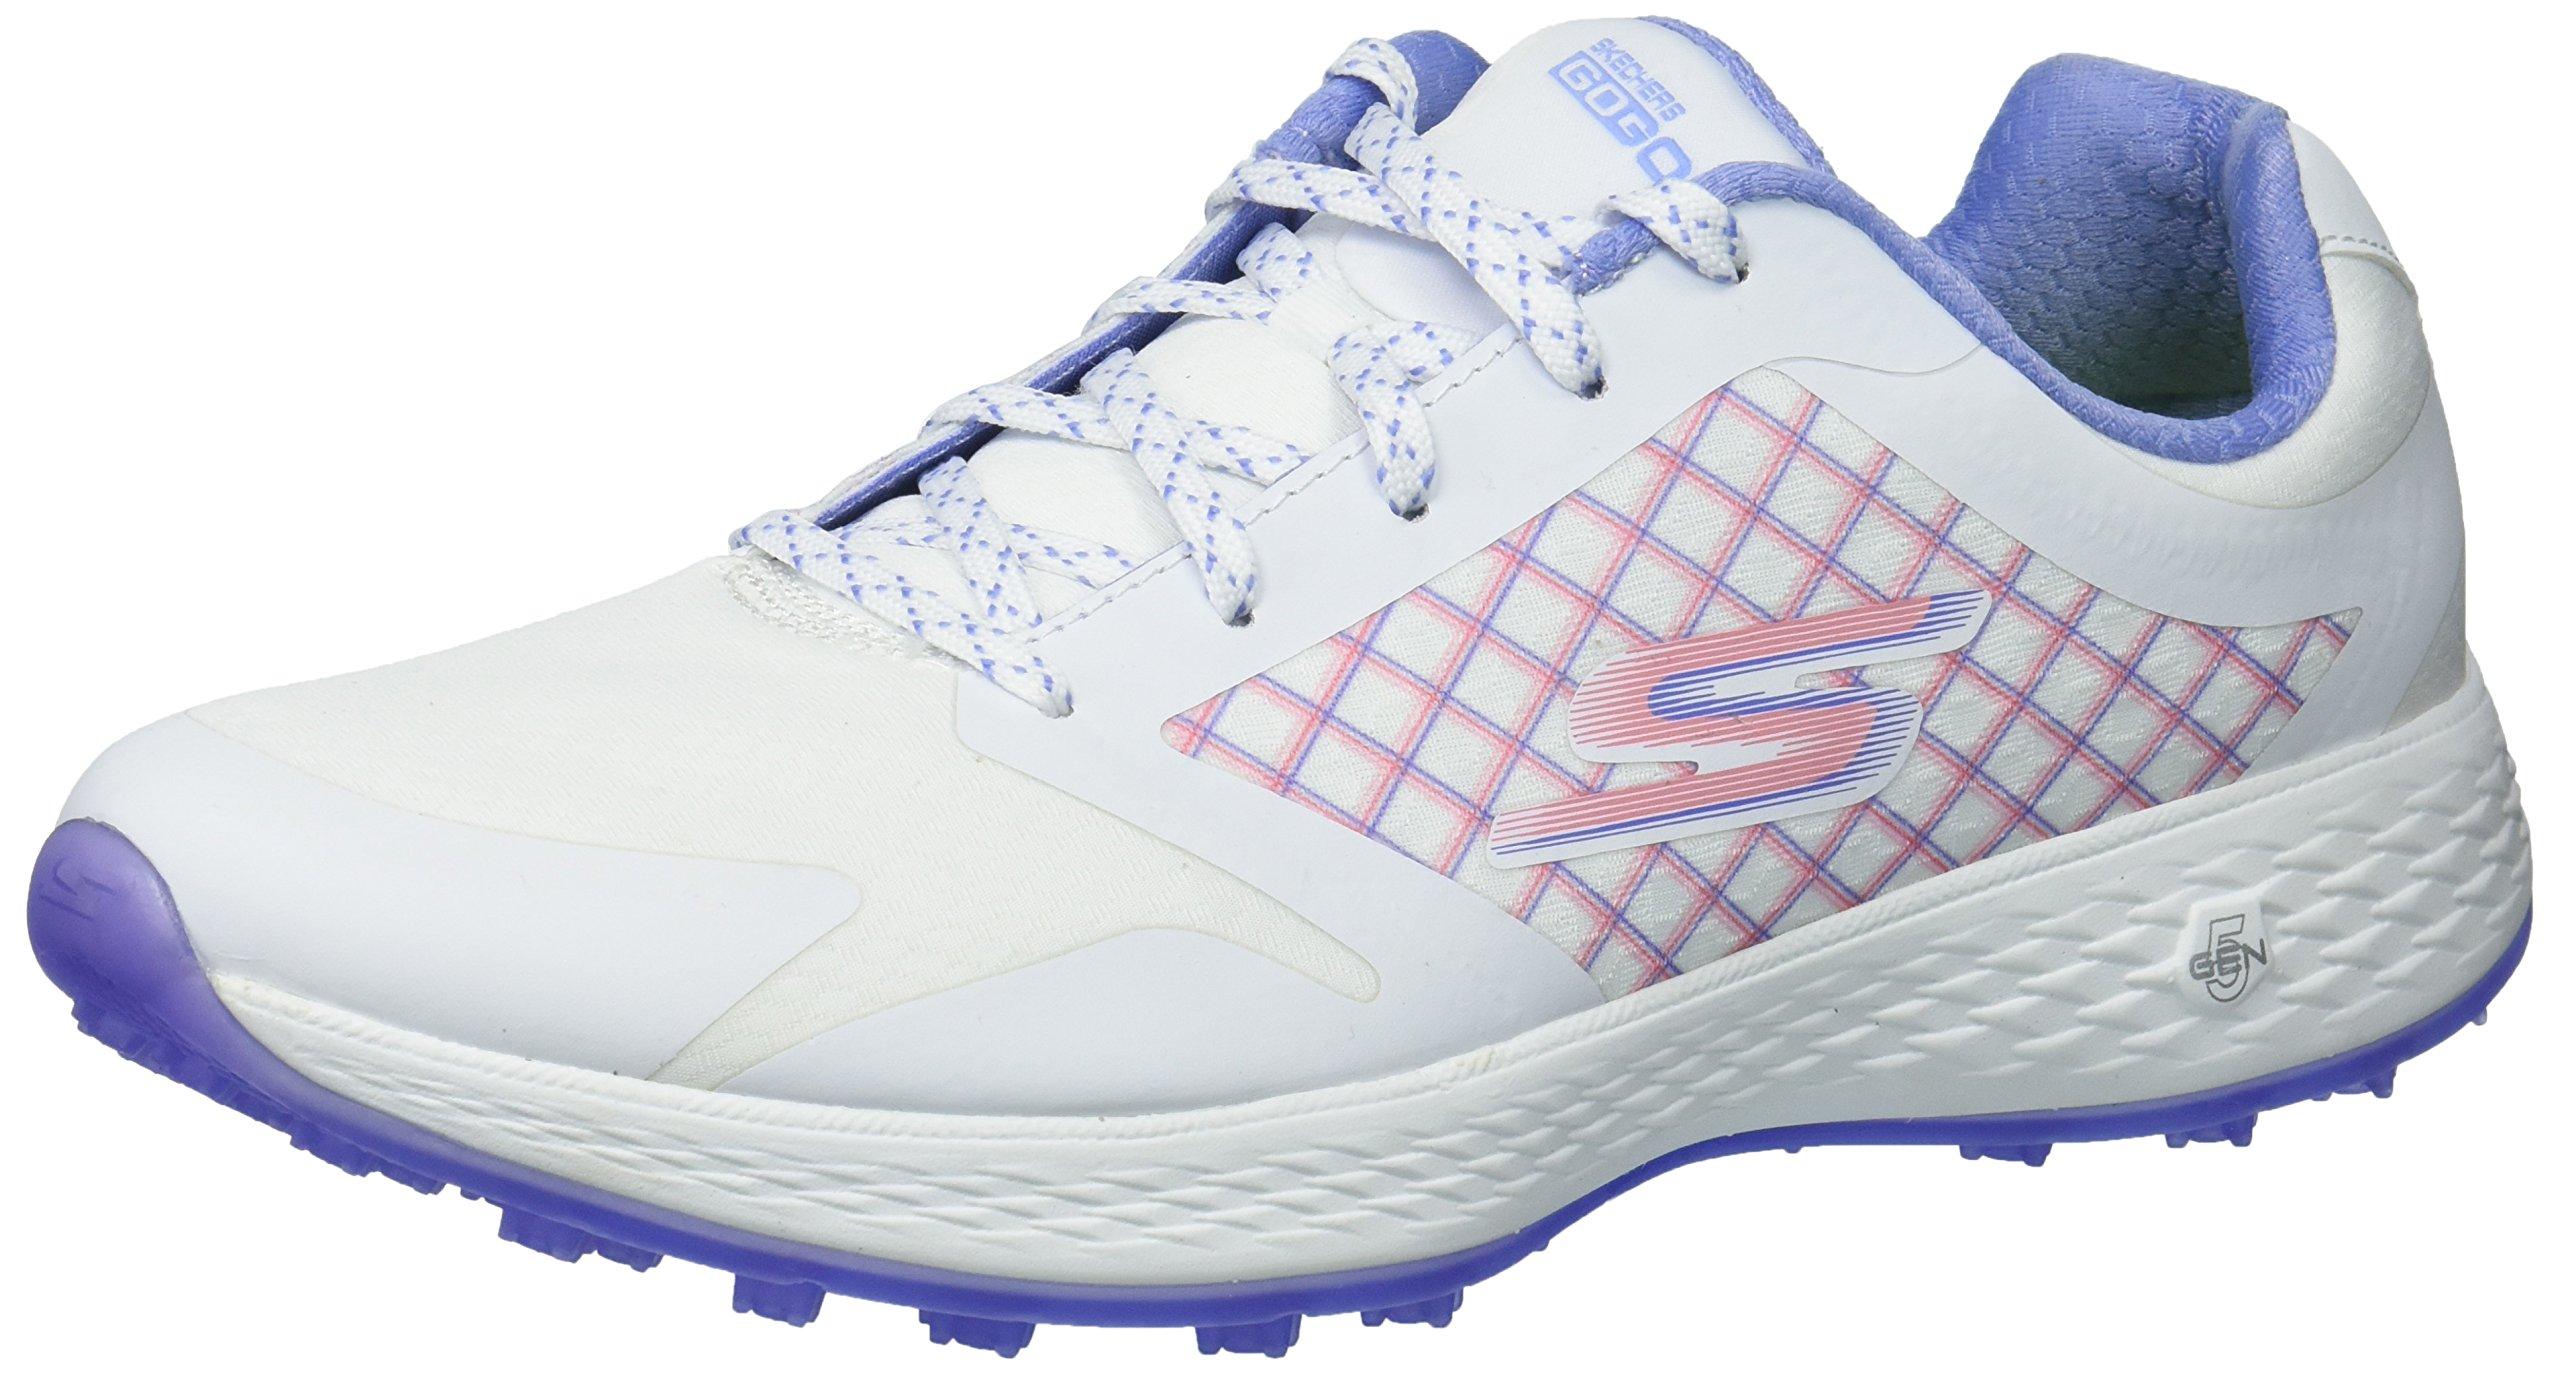 Skechers Performance Women's Go Eagle Rival Golf-Shoes,White/Lavender,8 M US